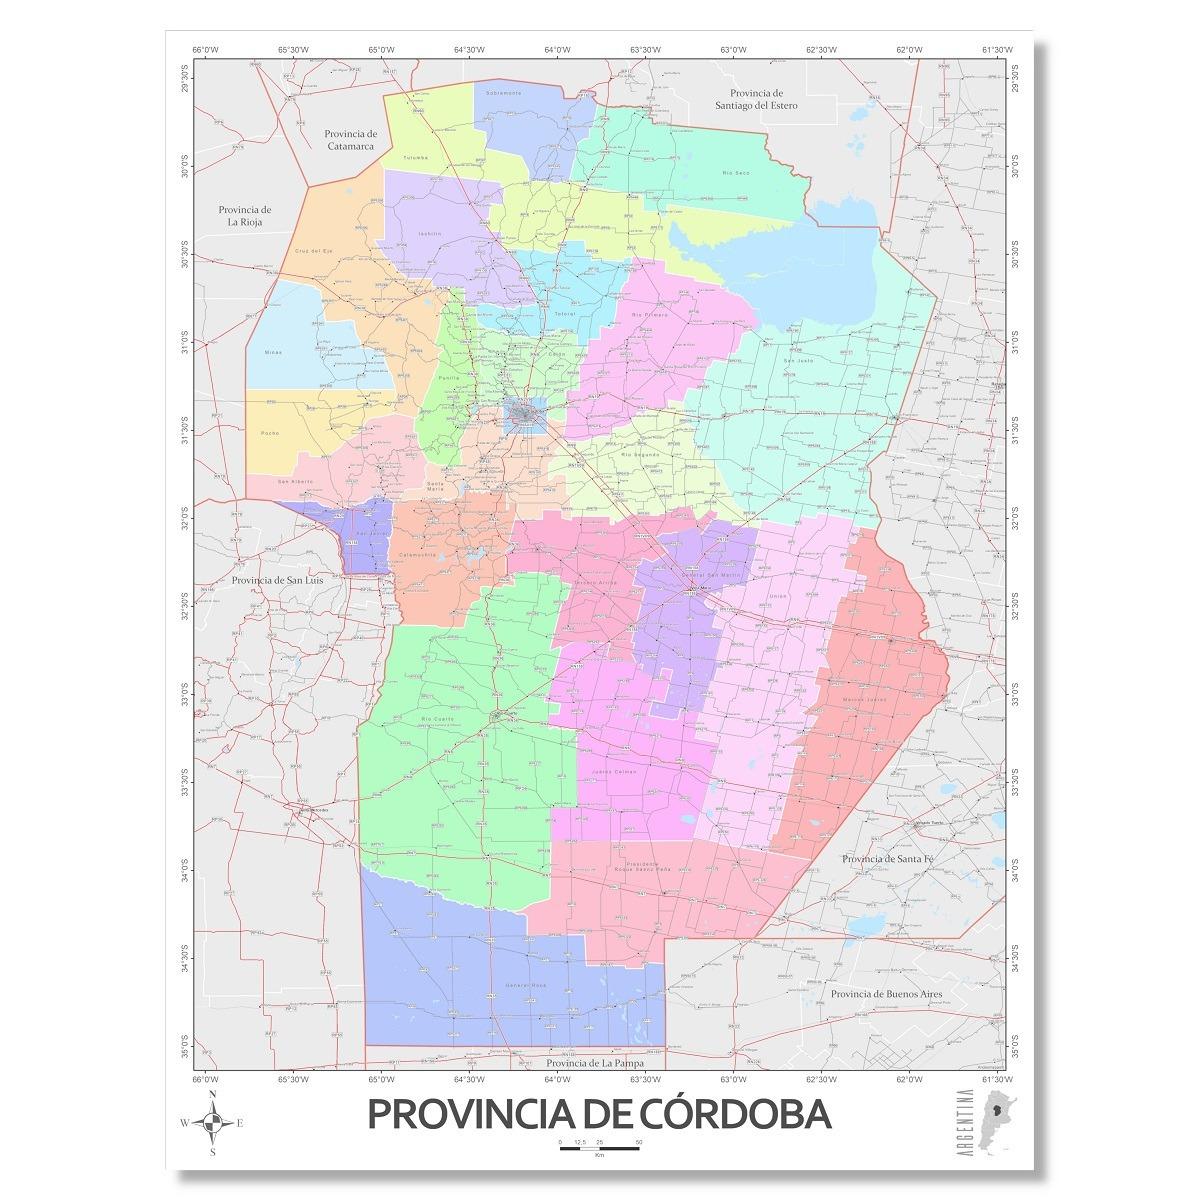 Mapa Provincia De Cordoba Politico.Mapa Politico Provincia De Cordoba 80cmx61cm